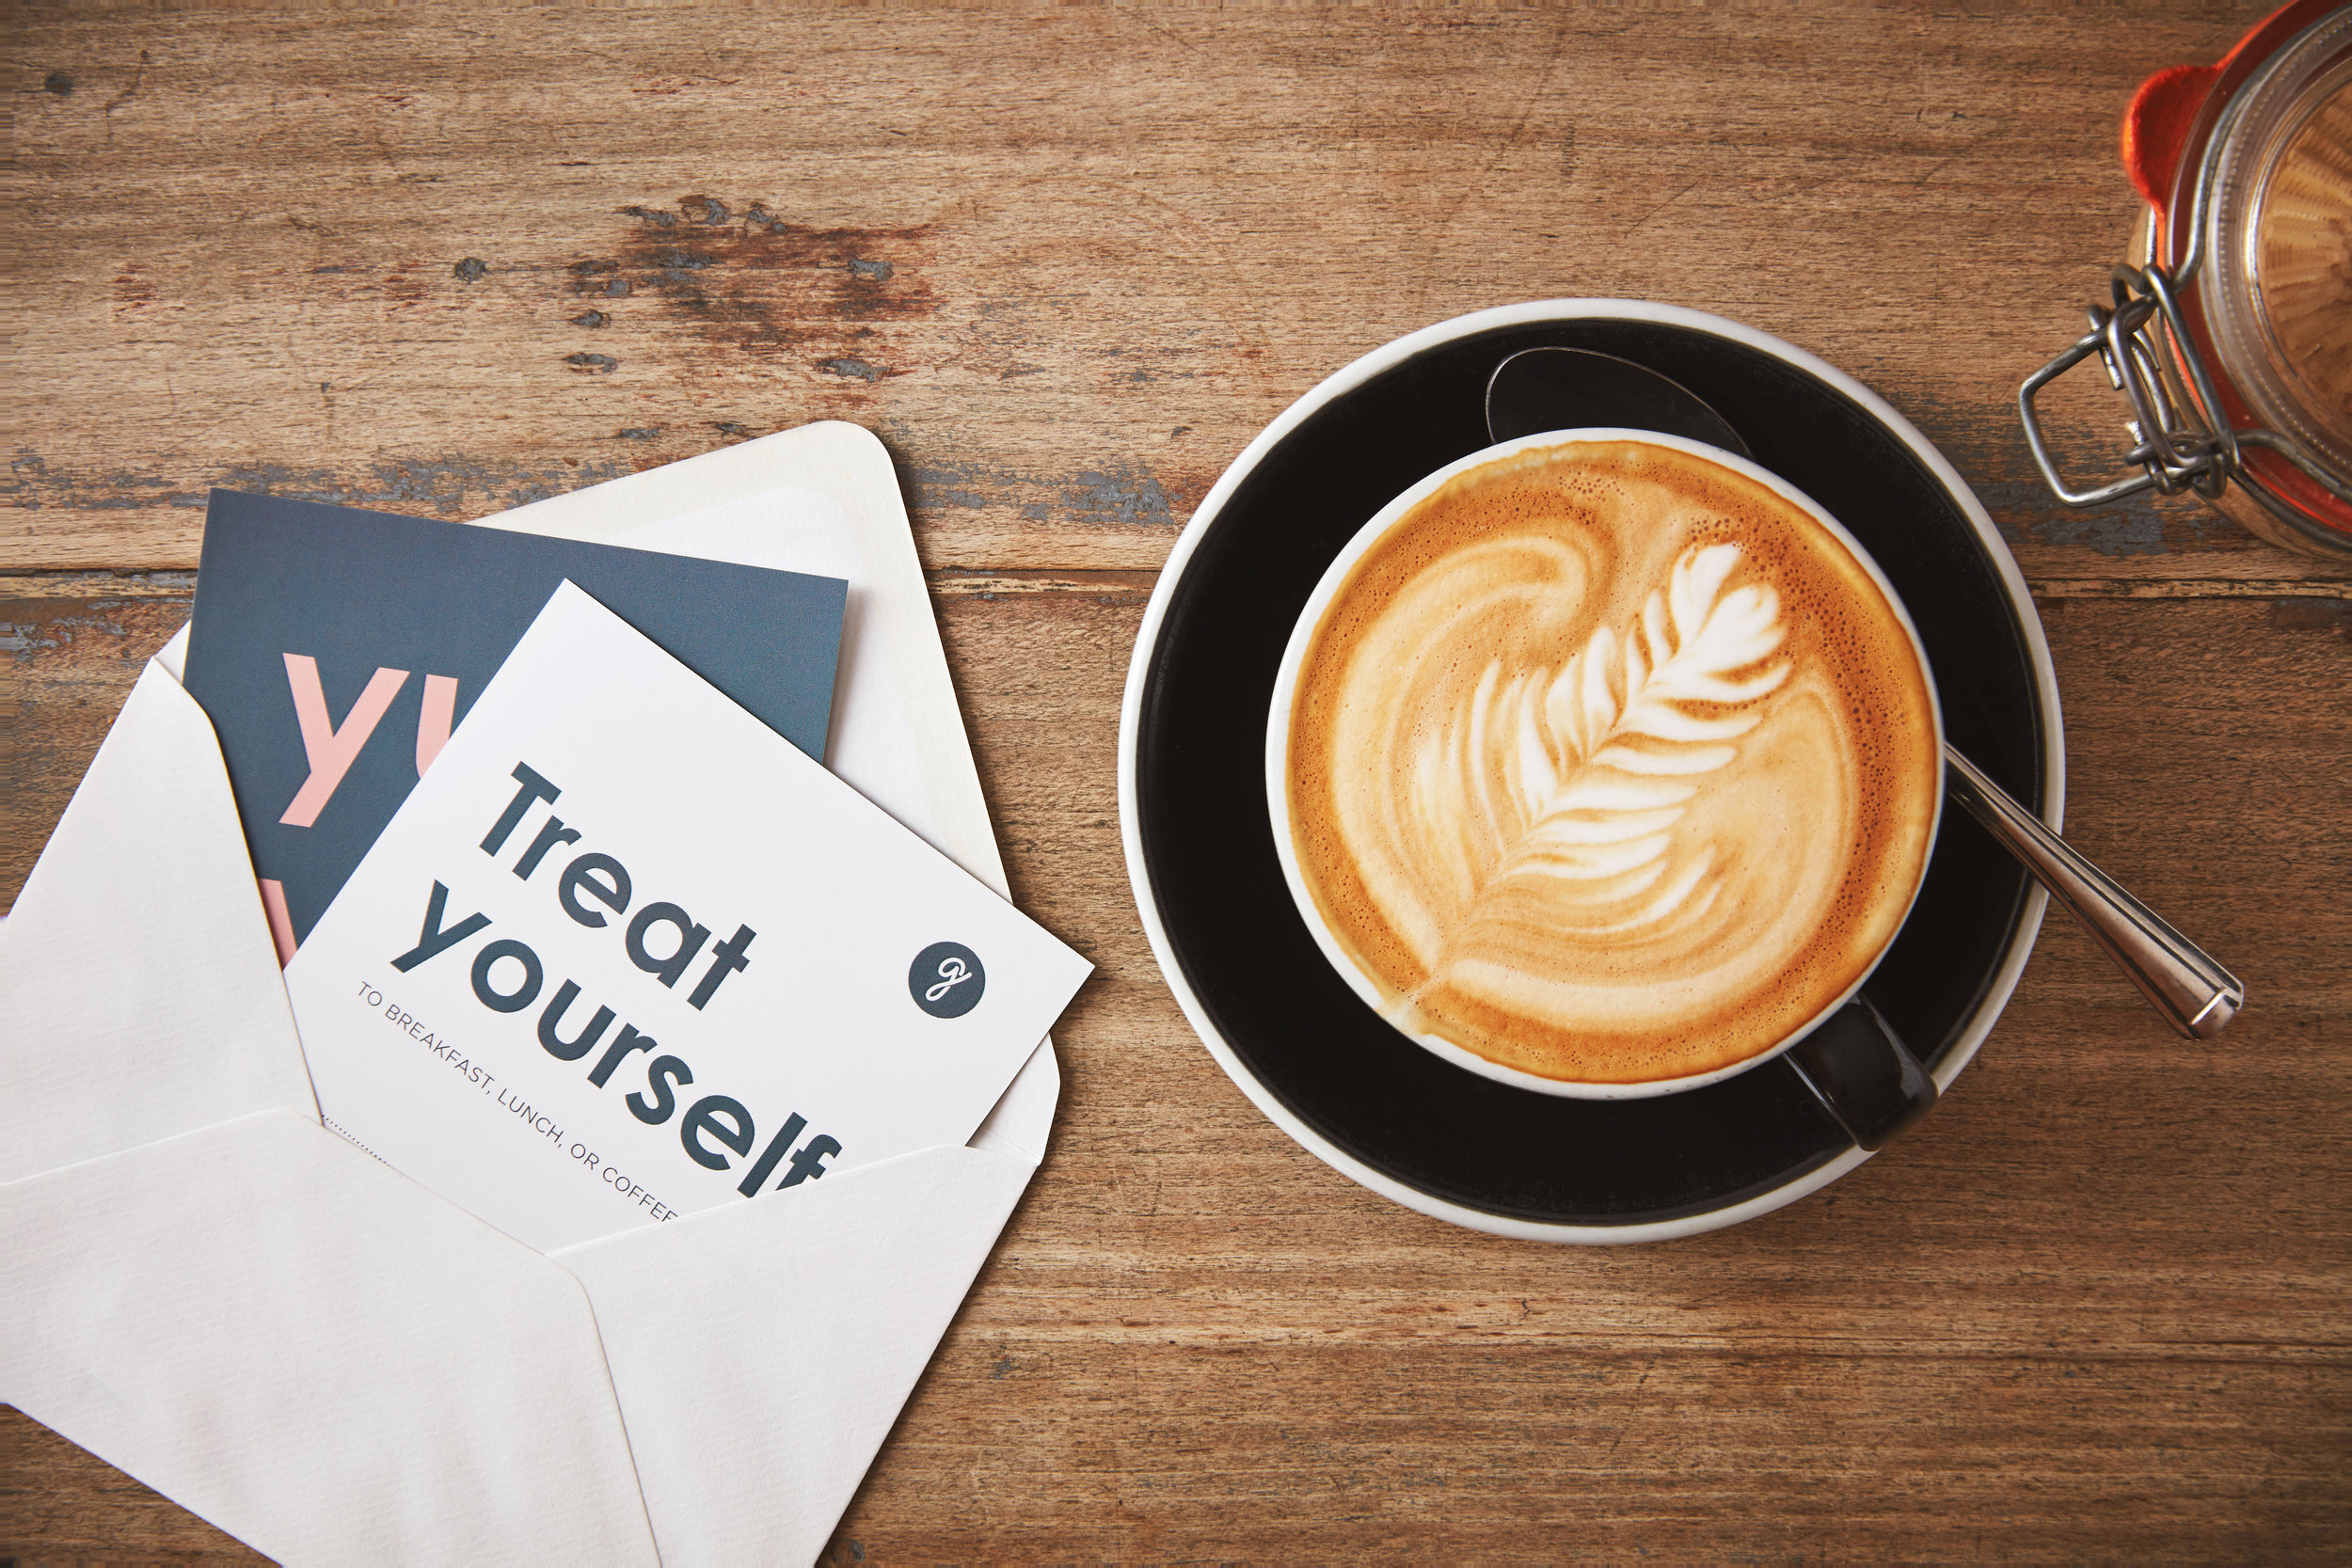 11_01_18_TheGrocer_CoffeeVoucher_001.jpg